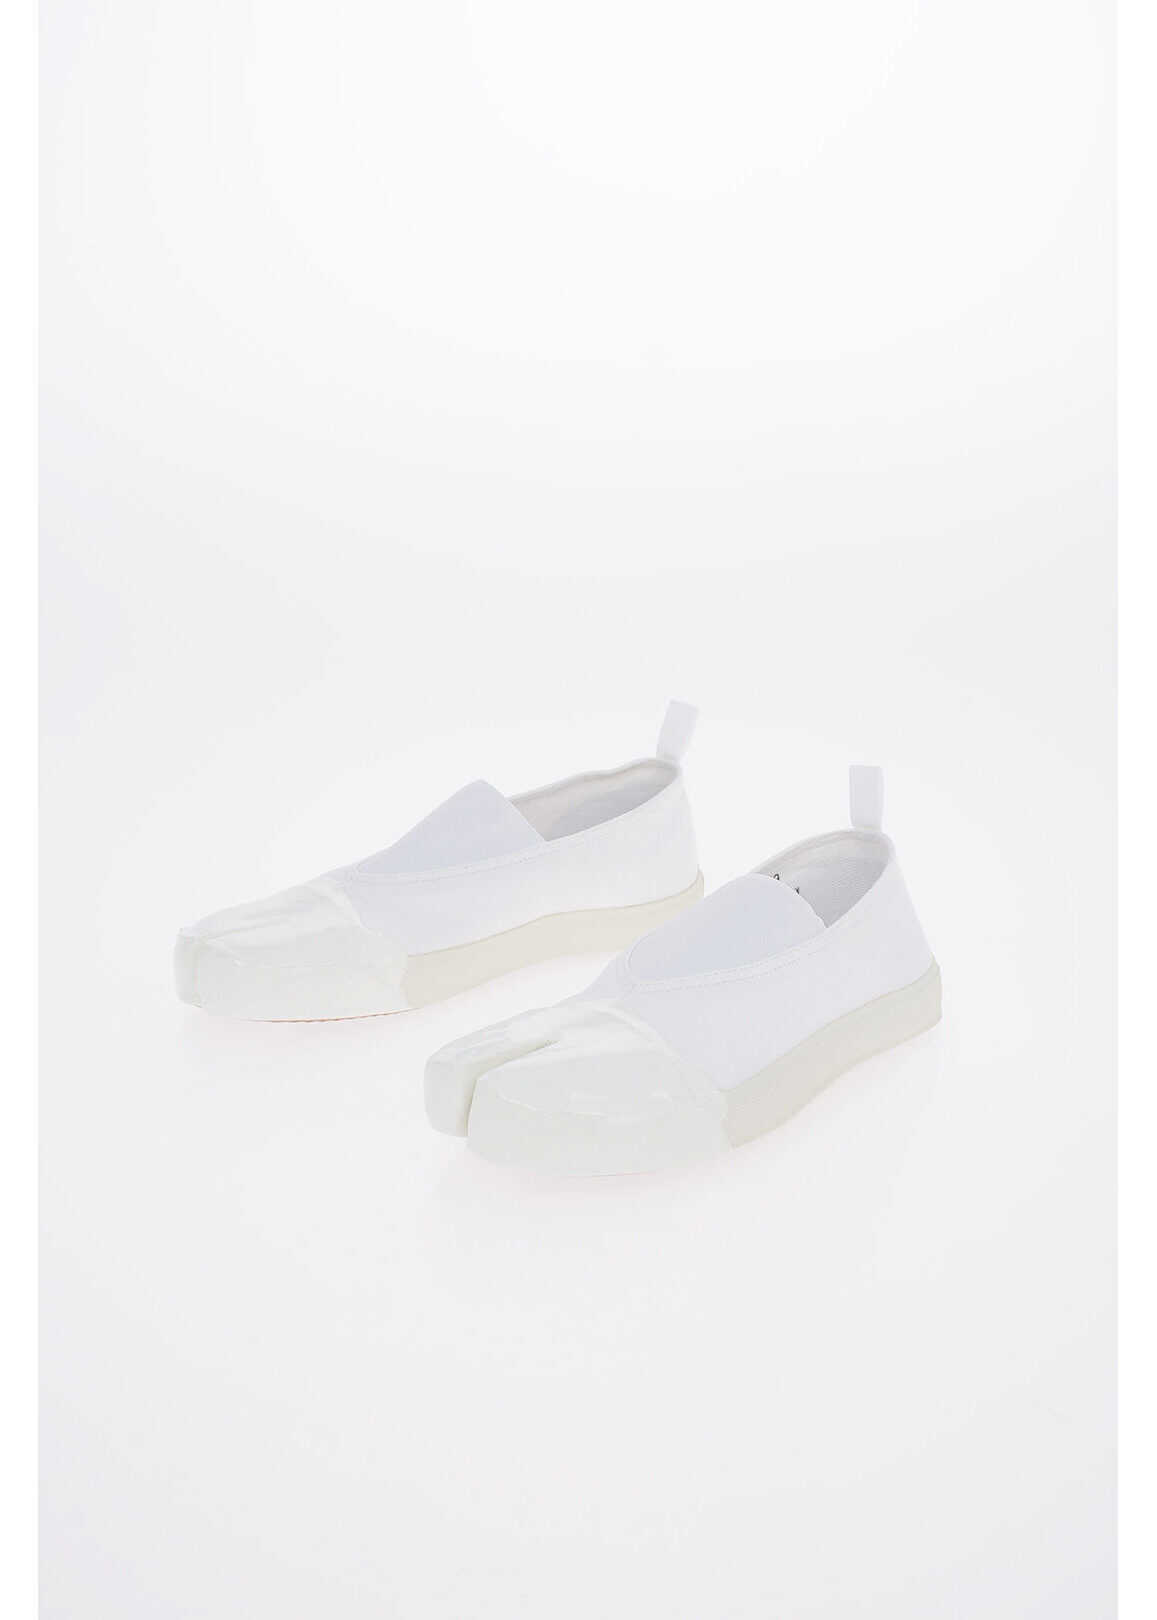 Maison Margiela MM22 Fabric TABI Slip On Sneakers WHITE imagine b-mall.ro